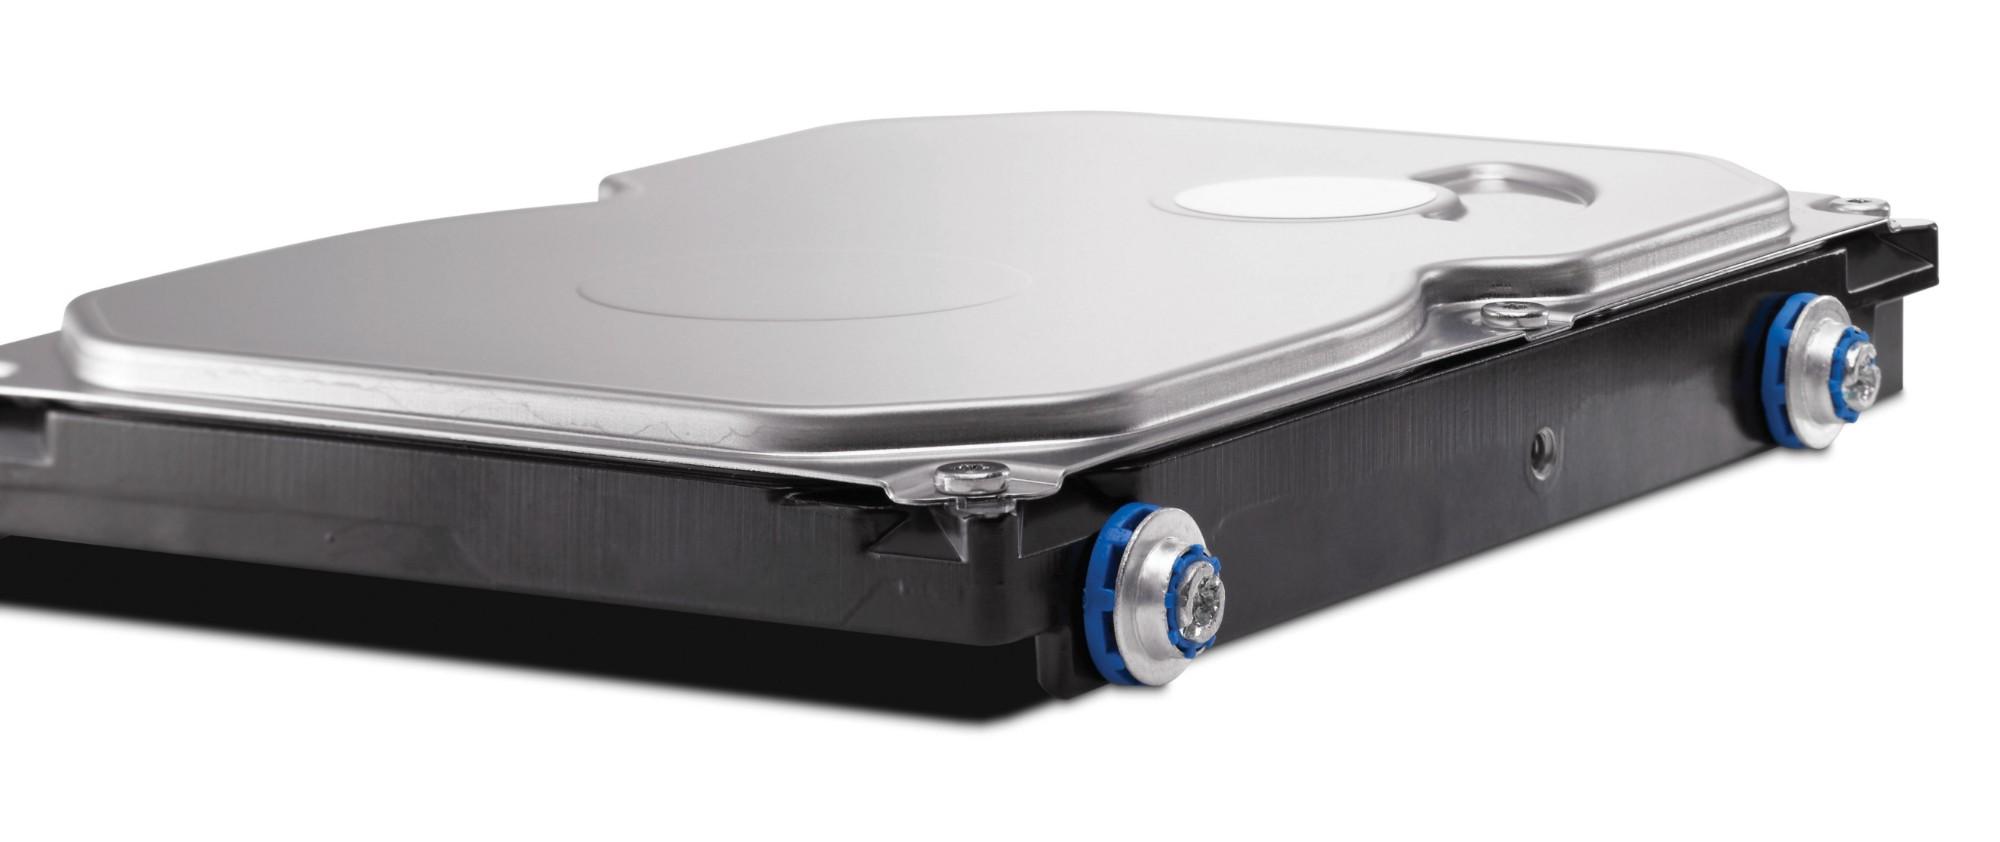 HP 3TB SATA 6Gb/s 7200 Hard Drive